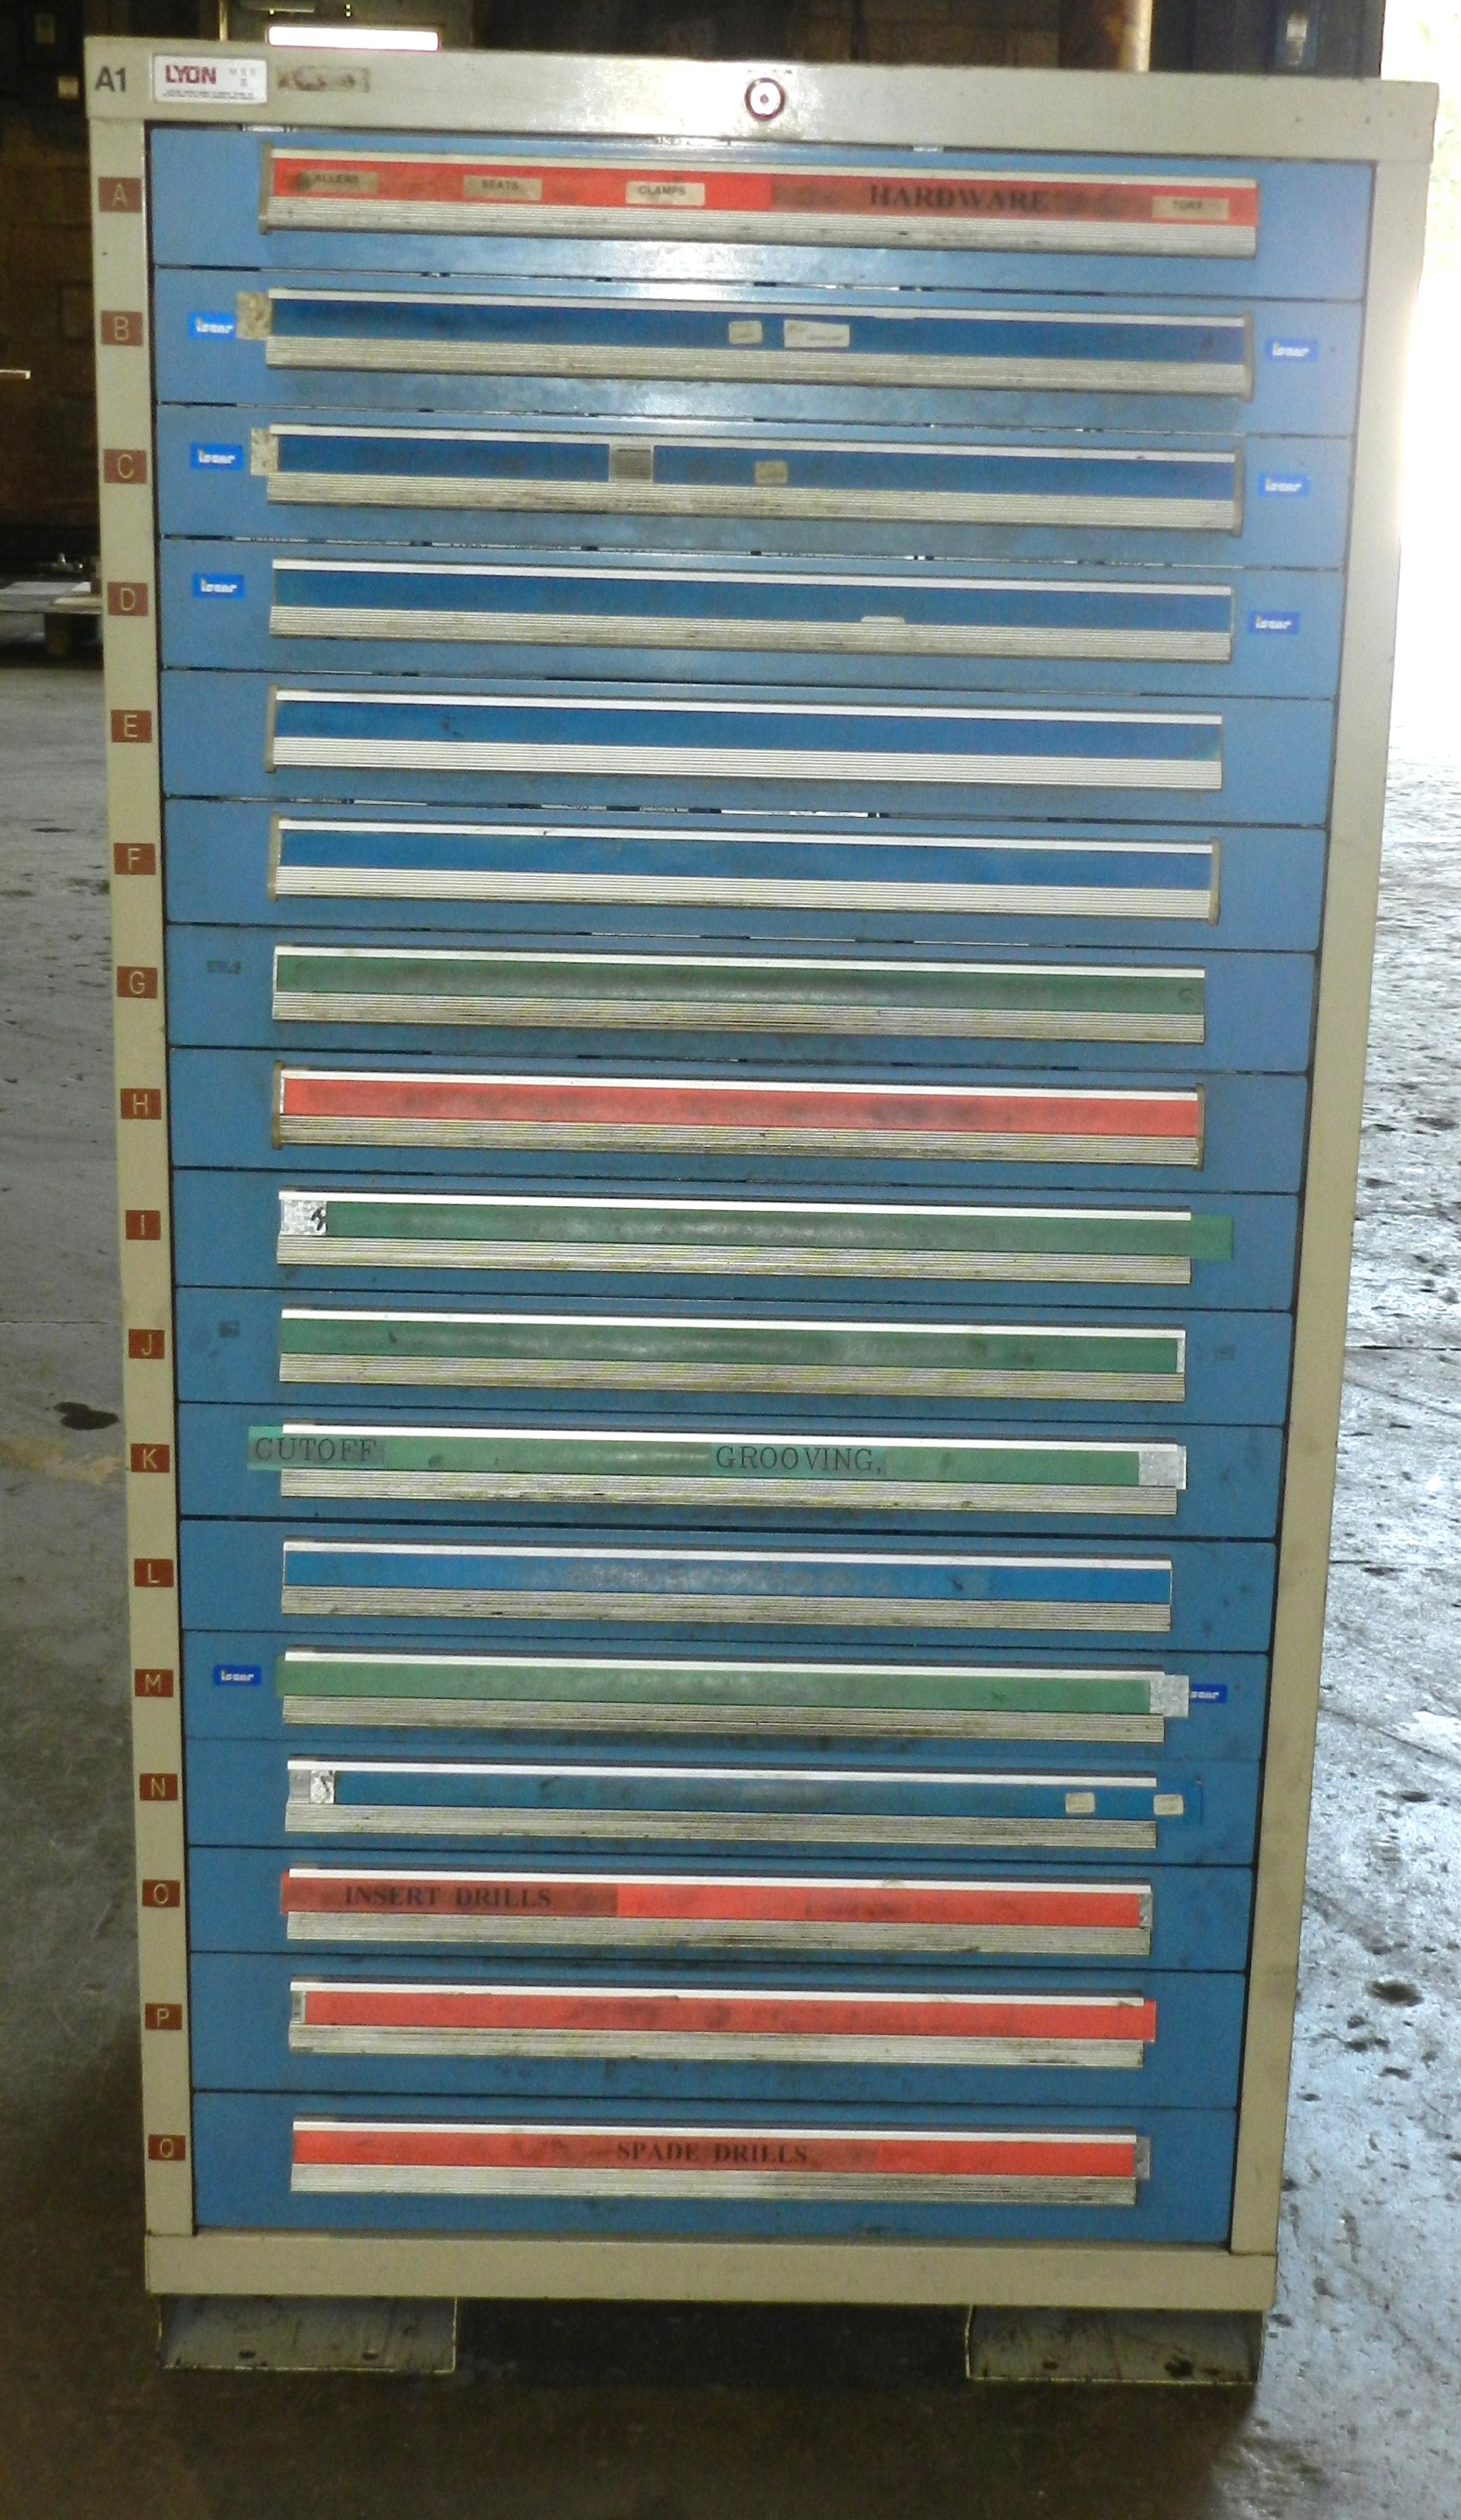 "Lot 76 - Lyon 17 Drawer Vidmar Industrial Cabinet 30"" x 27.5"" x 59"""